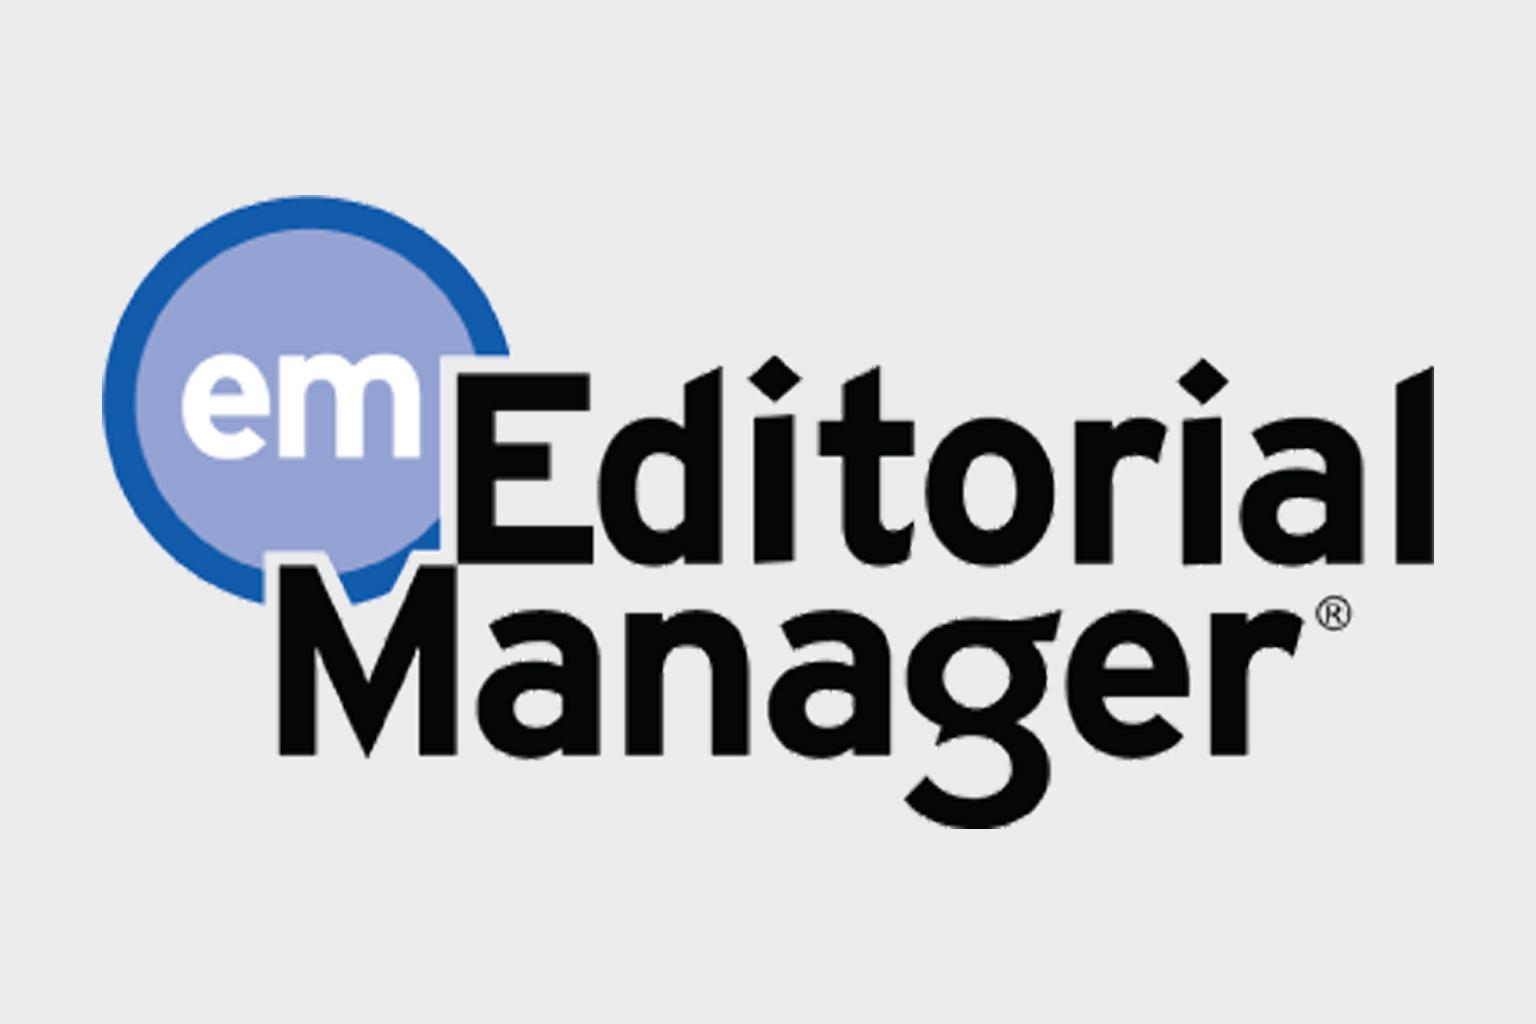 Editorial Manager logo